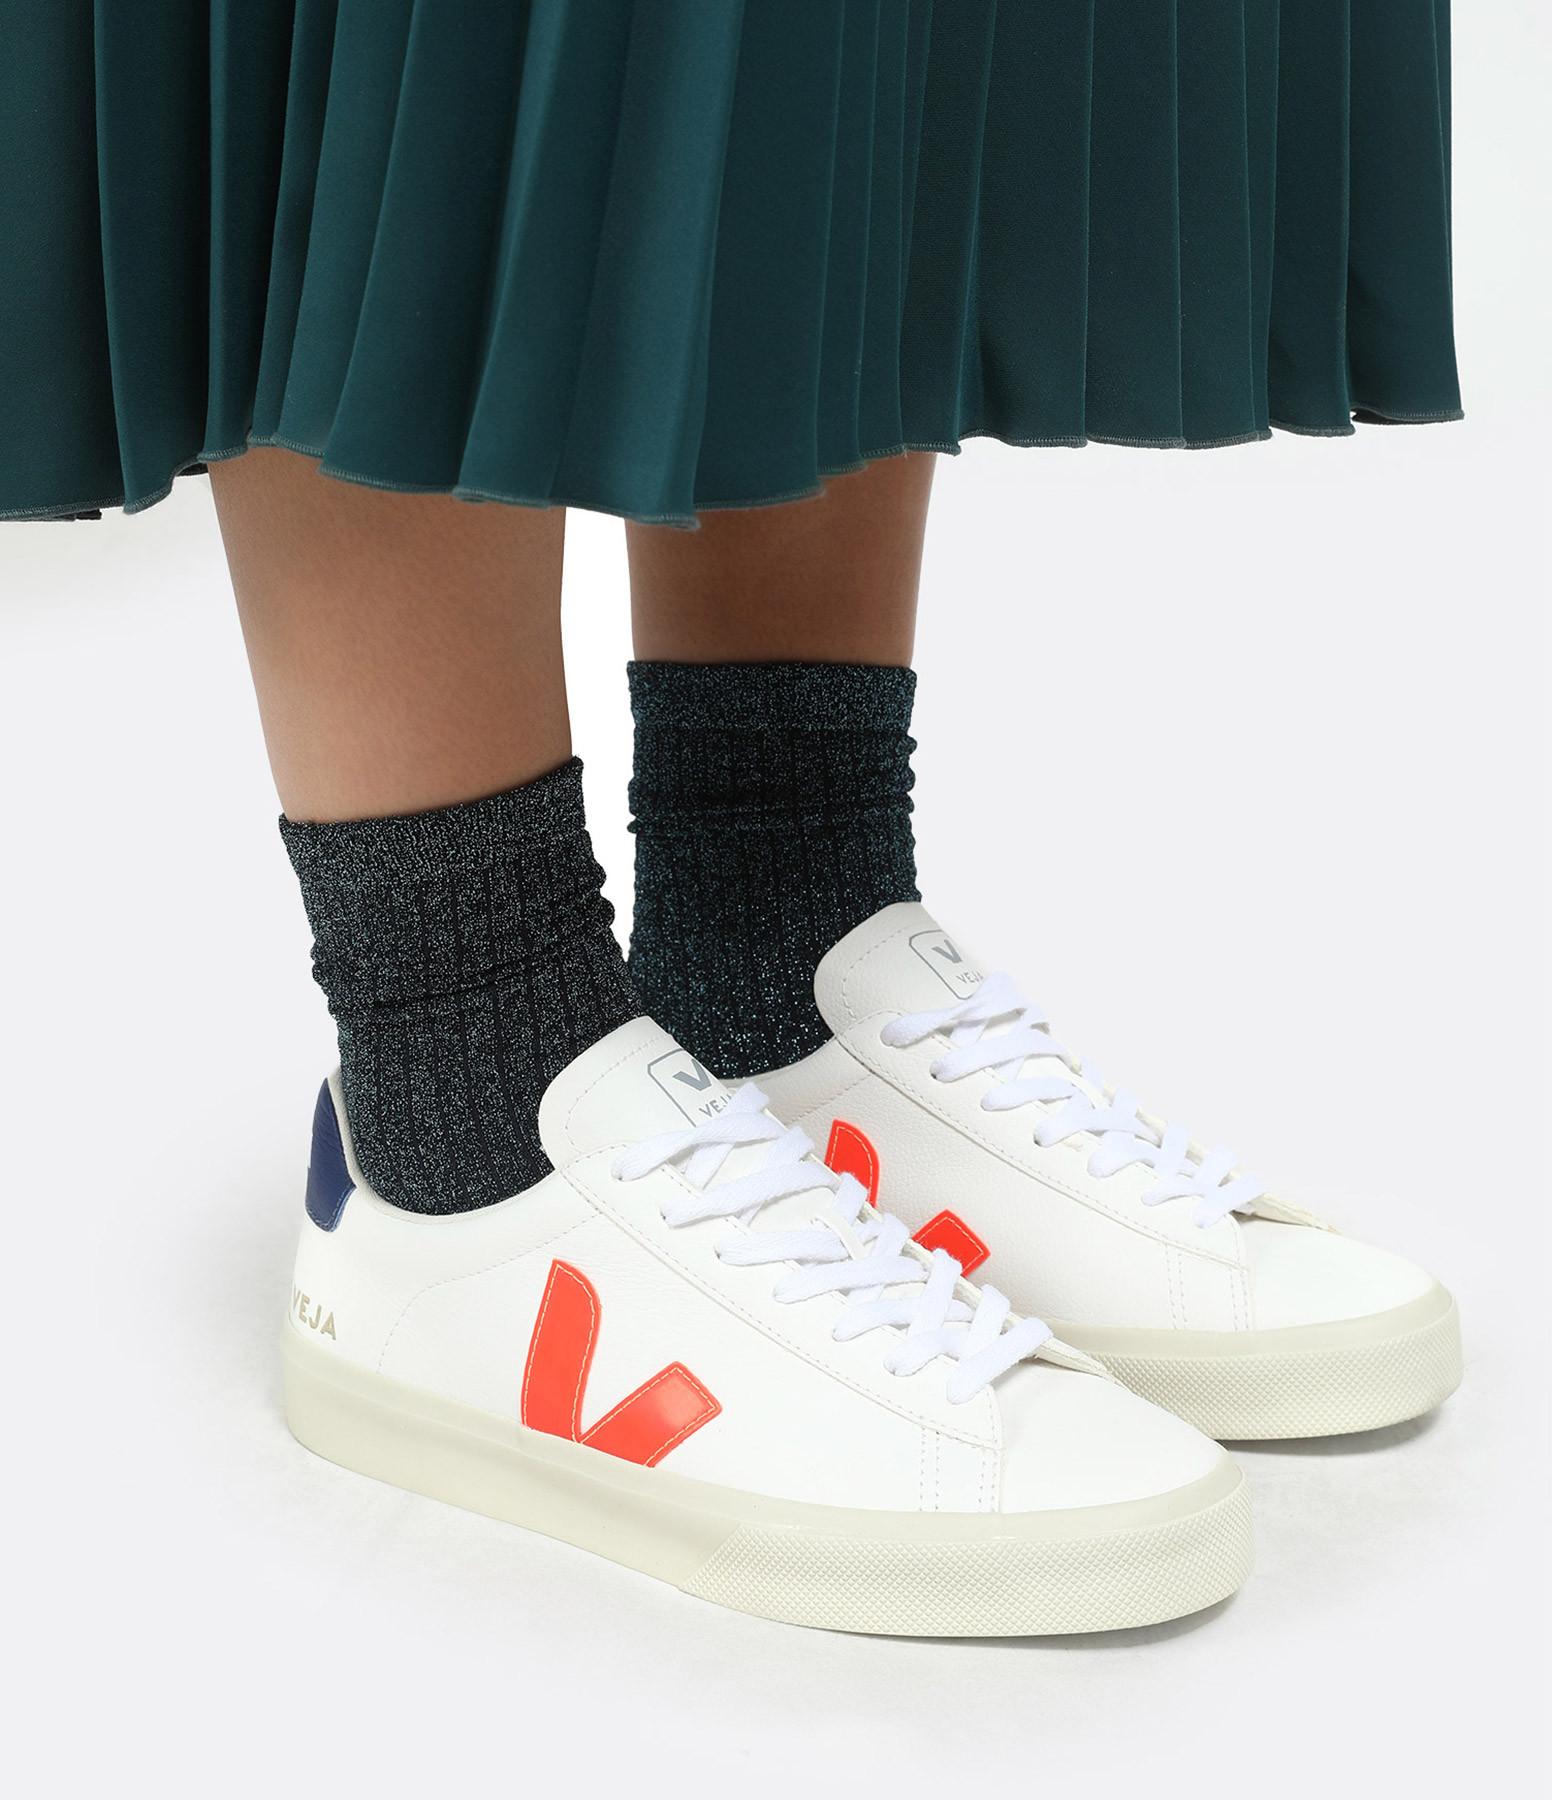 VEJA - Baskets Campo Chromefree Extra White Orange Fluo